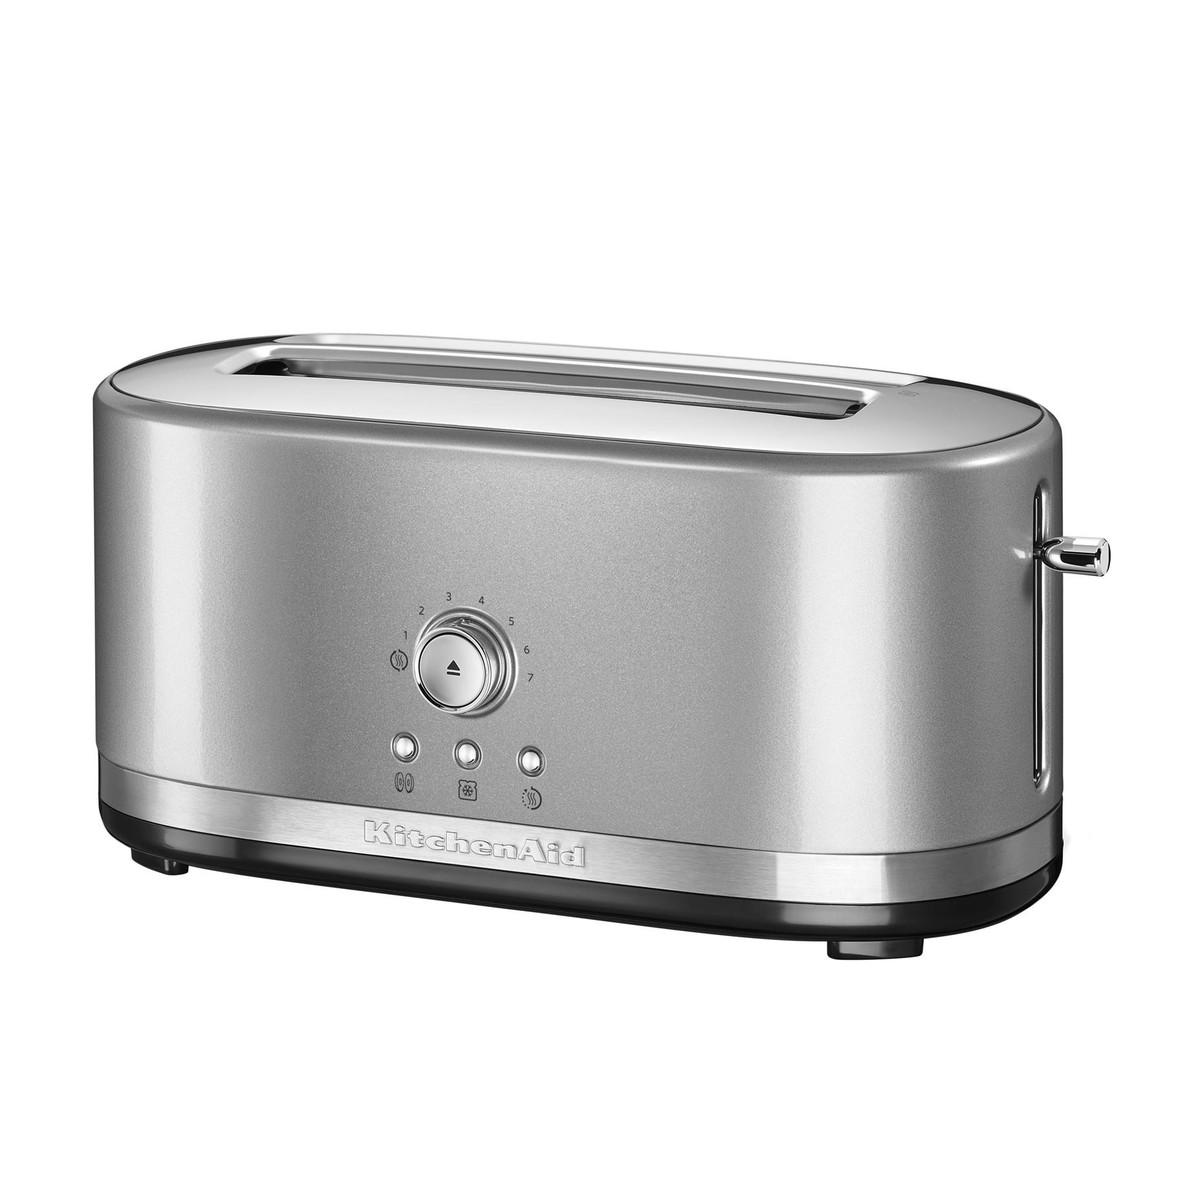 kitchenaid kmt manual control toaster  kitchenaid  - kitchenaid  kitchenaid kmt manual control toaster silverglossywith  long slots